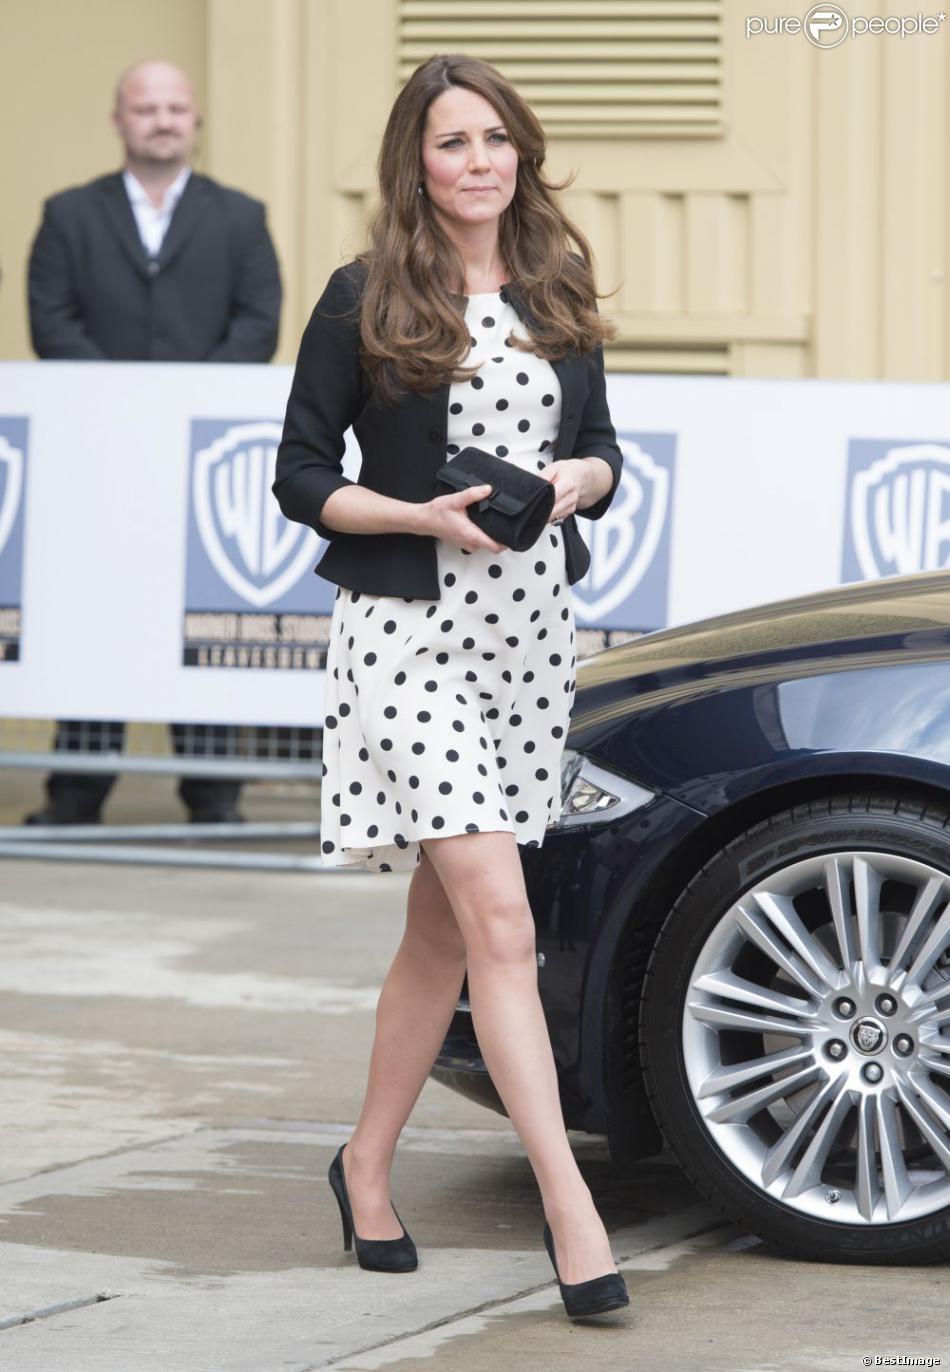 Robe à pois pour invité mariage Kate Middleton